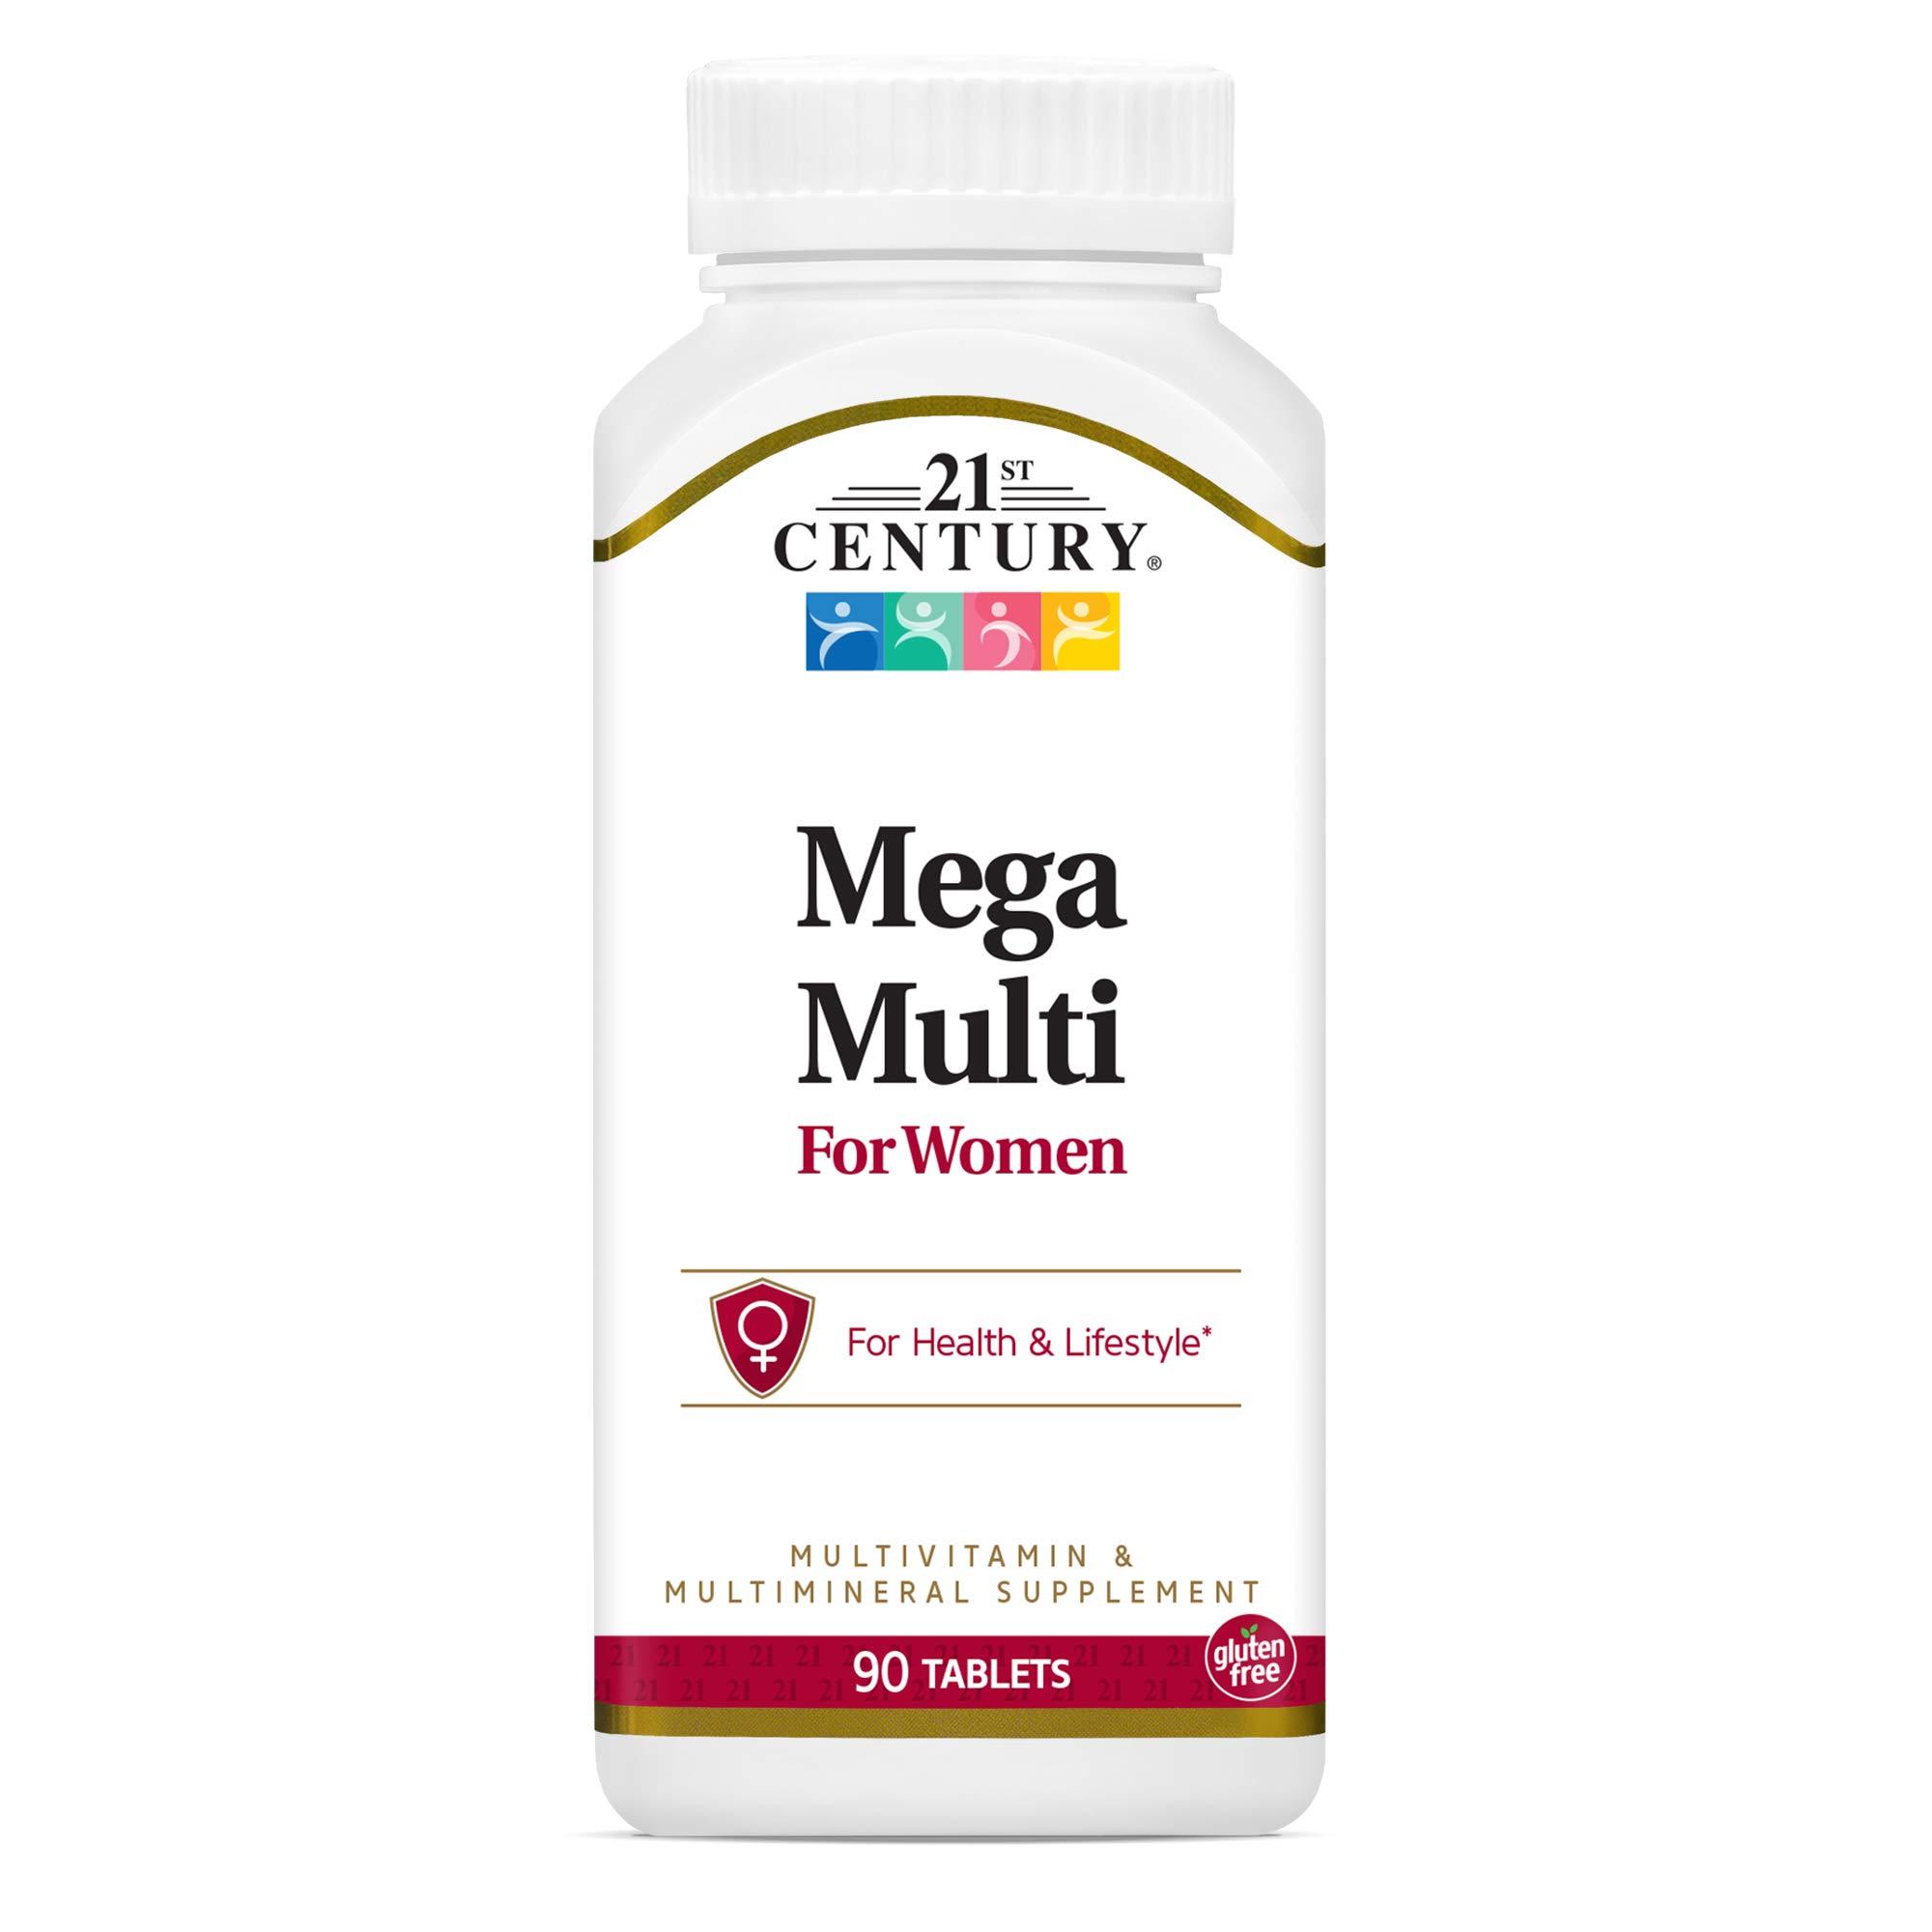 21st Century Mega Multi for Women Tablets, 90 Count (22659)